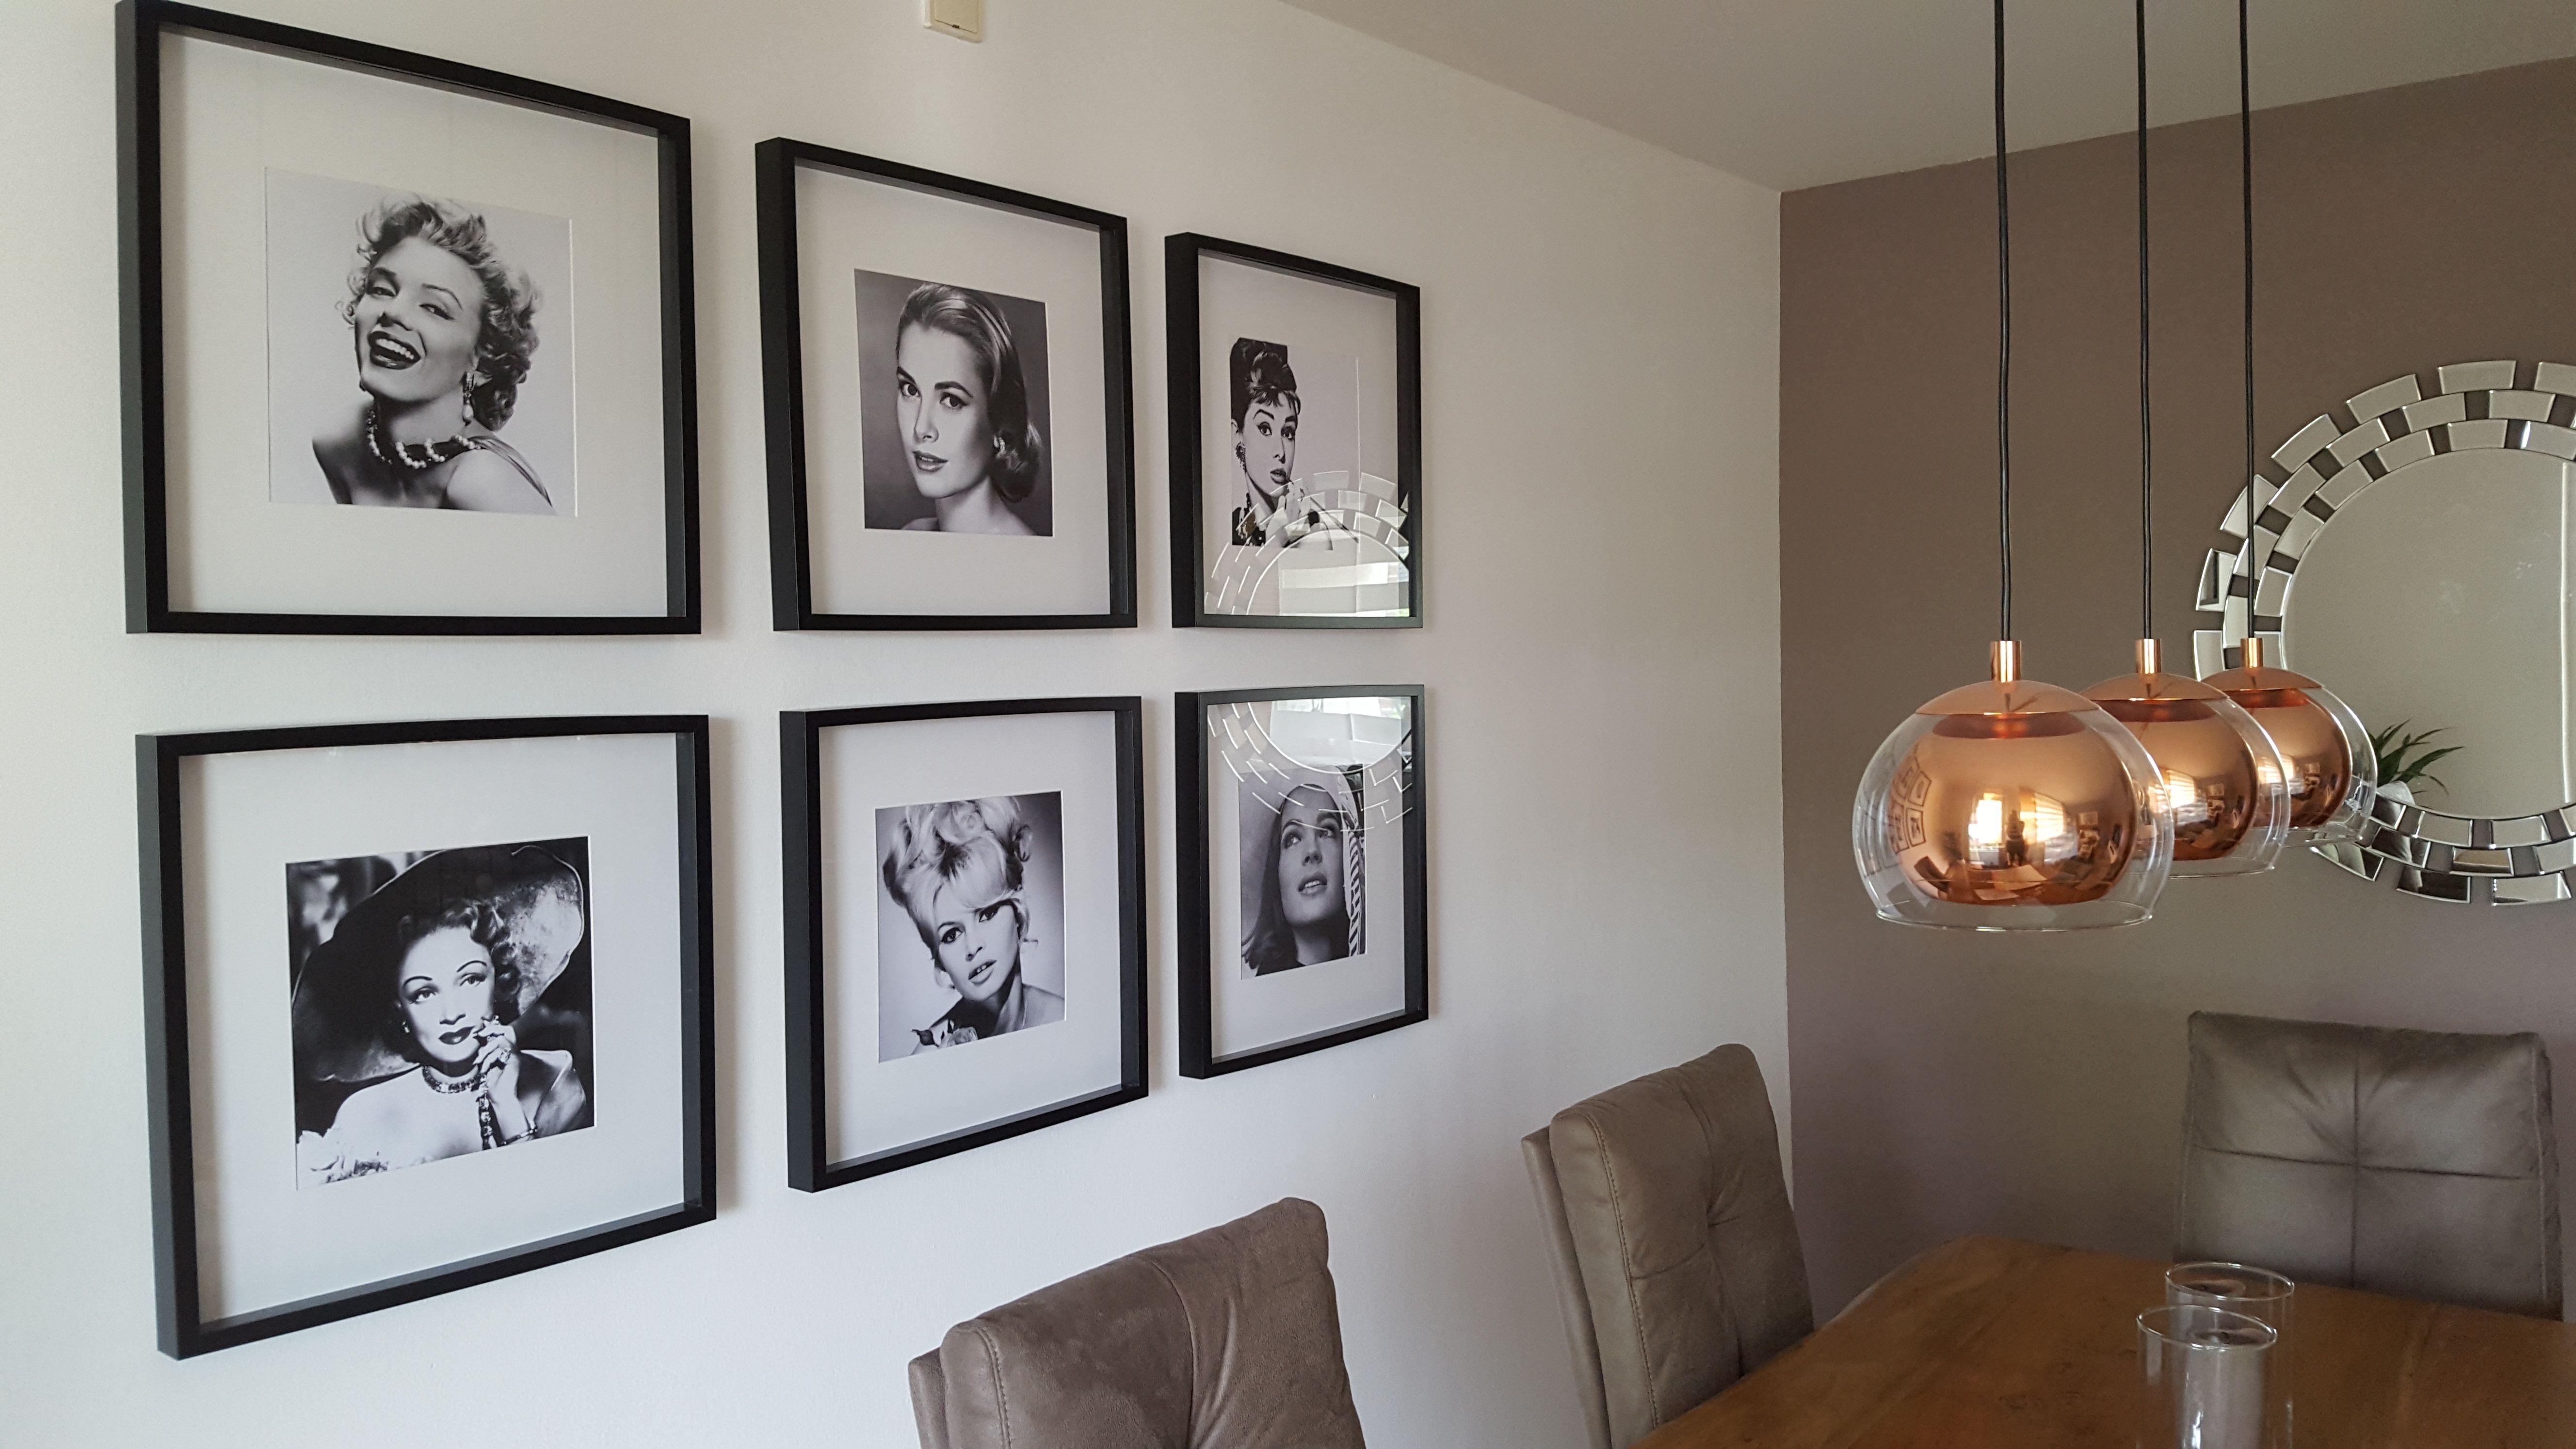 Berühmt Stahlrahmengelenke Galerie - Benutzerdefinierte Bilderrahmen ...